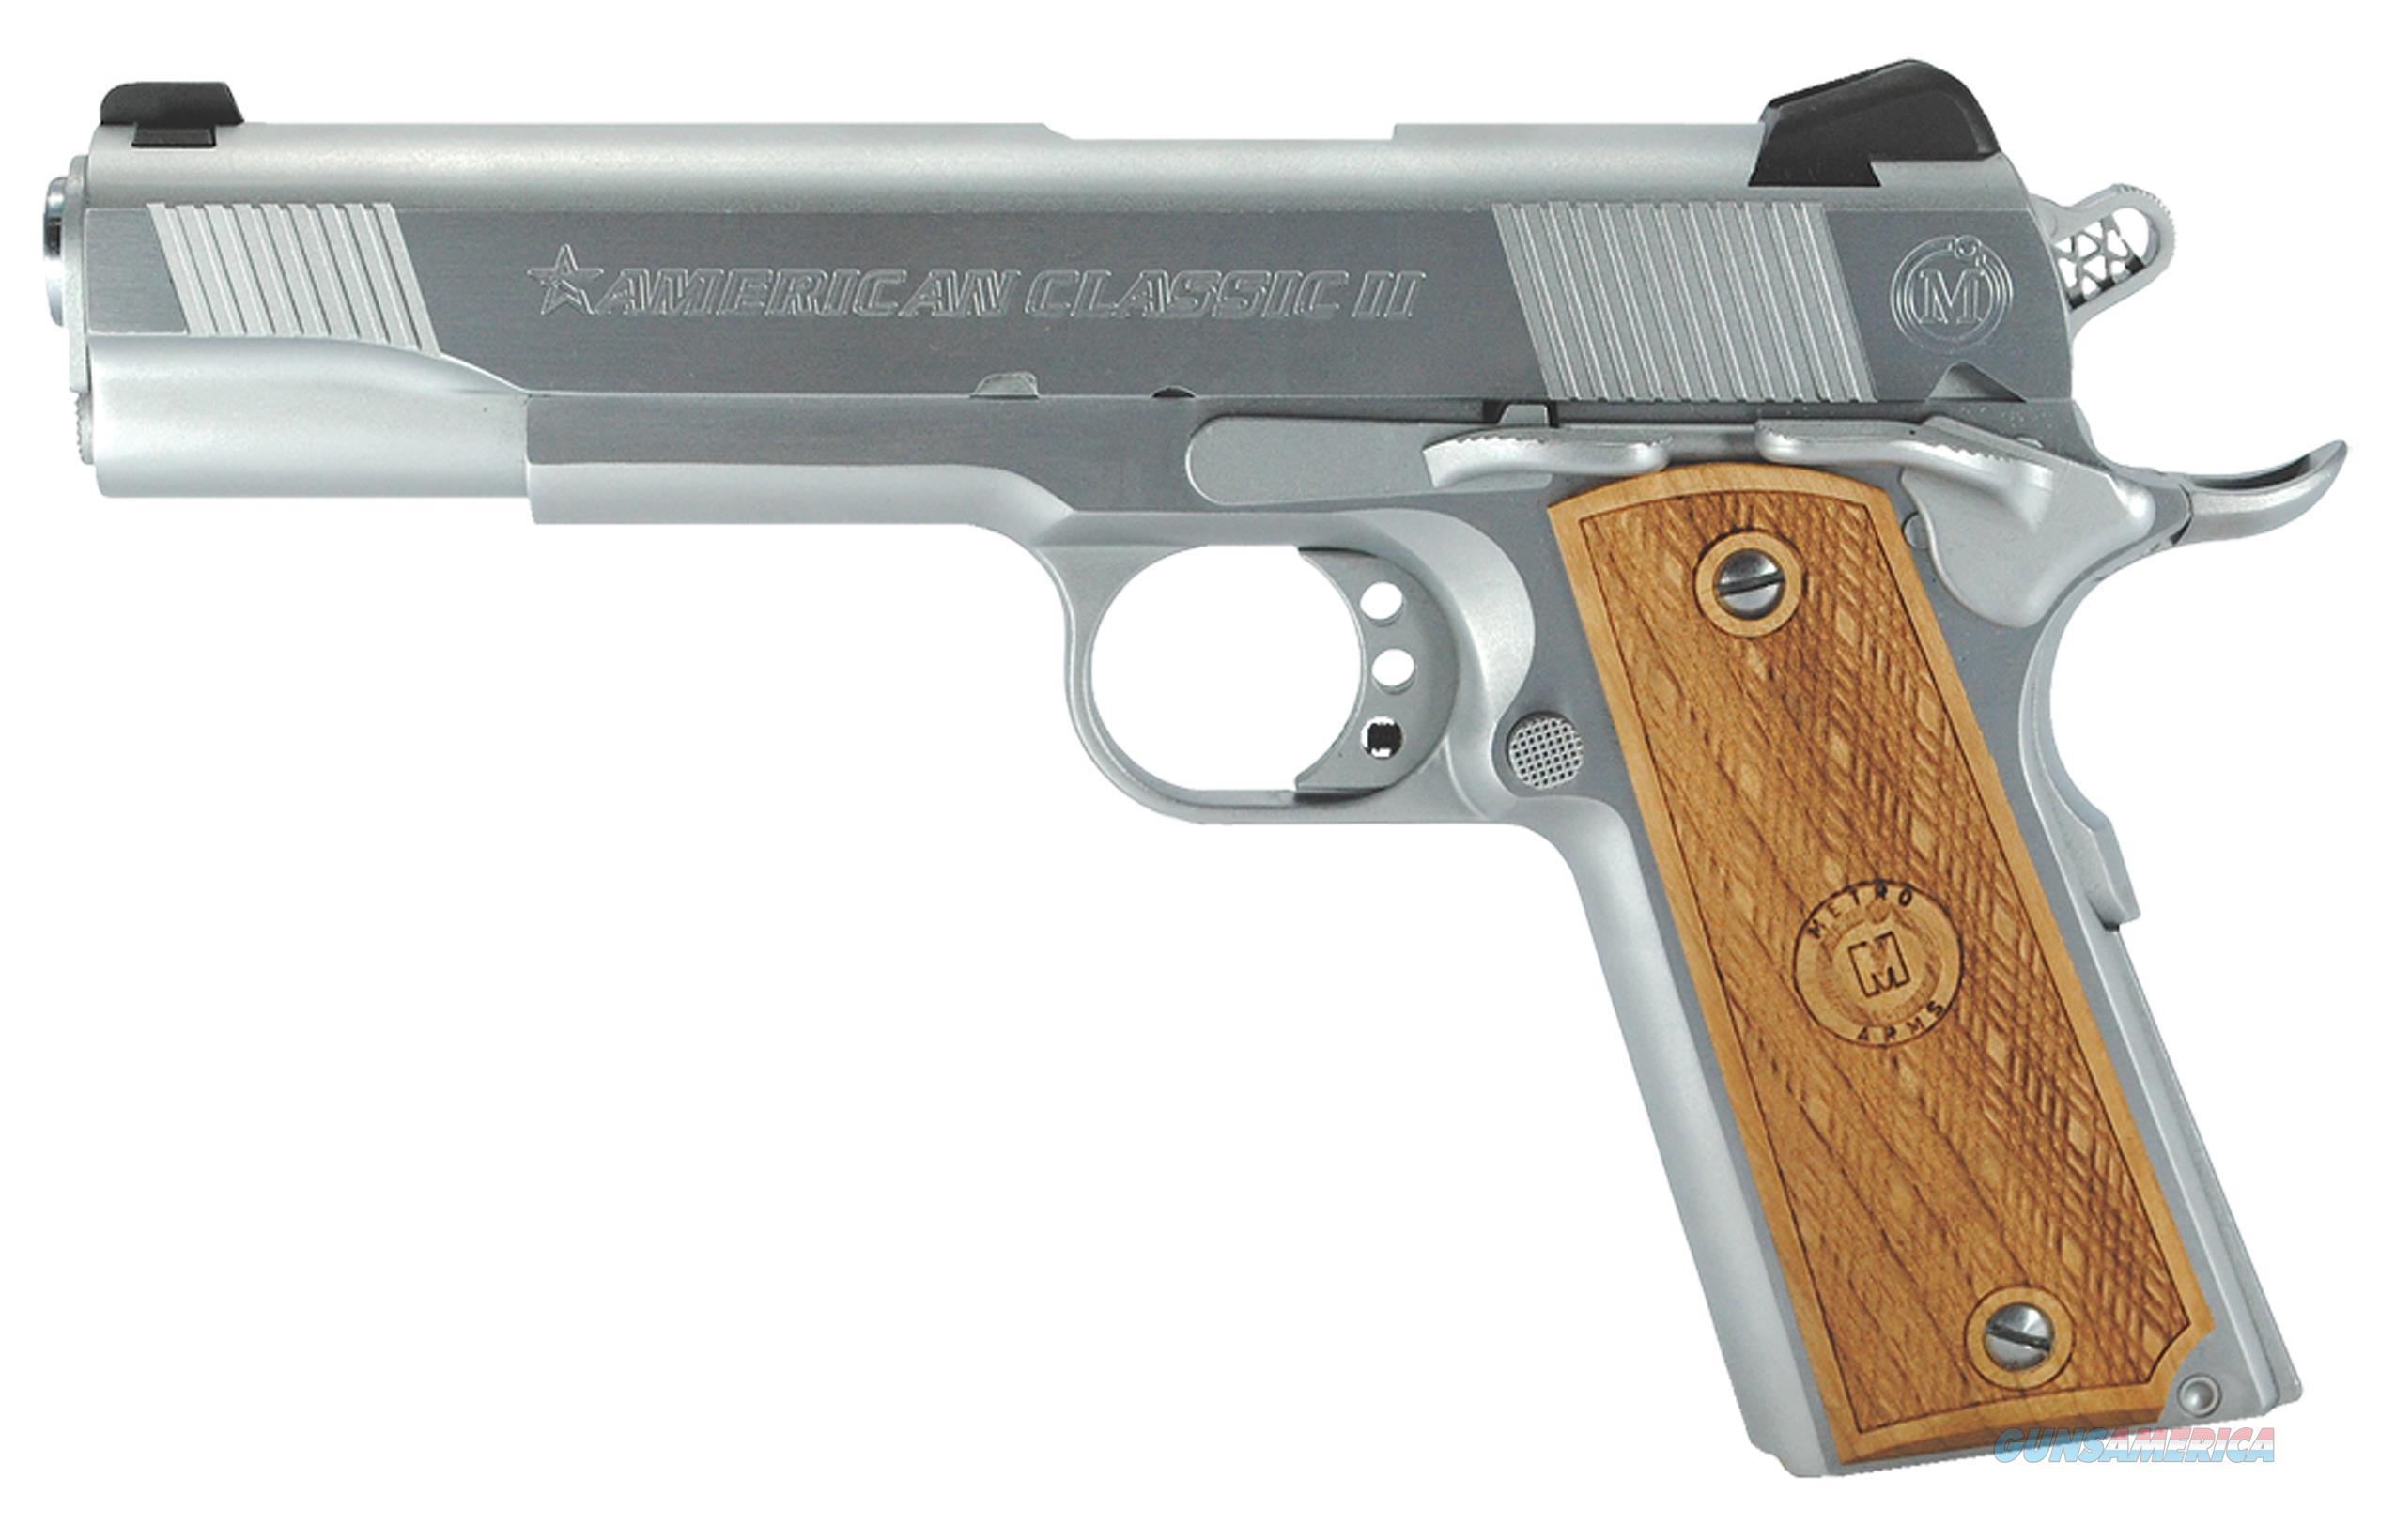 American Classic Arms Acii 45Auto 8Rd Chrome AC45G2C  Guns > Pistols > IJ Misc Pistols